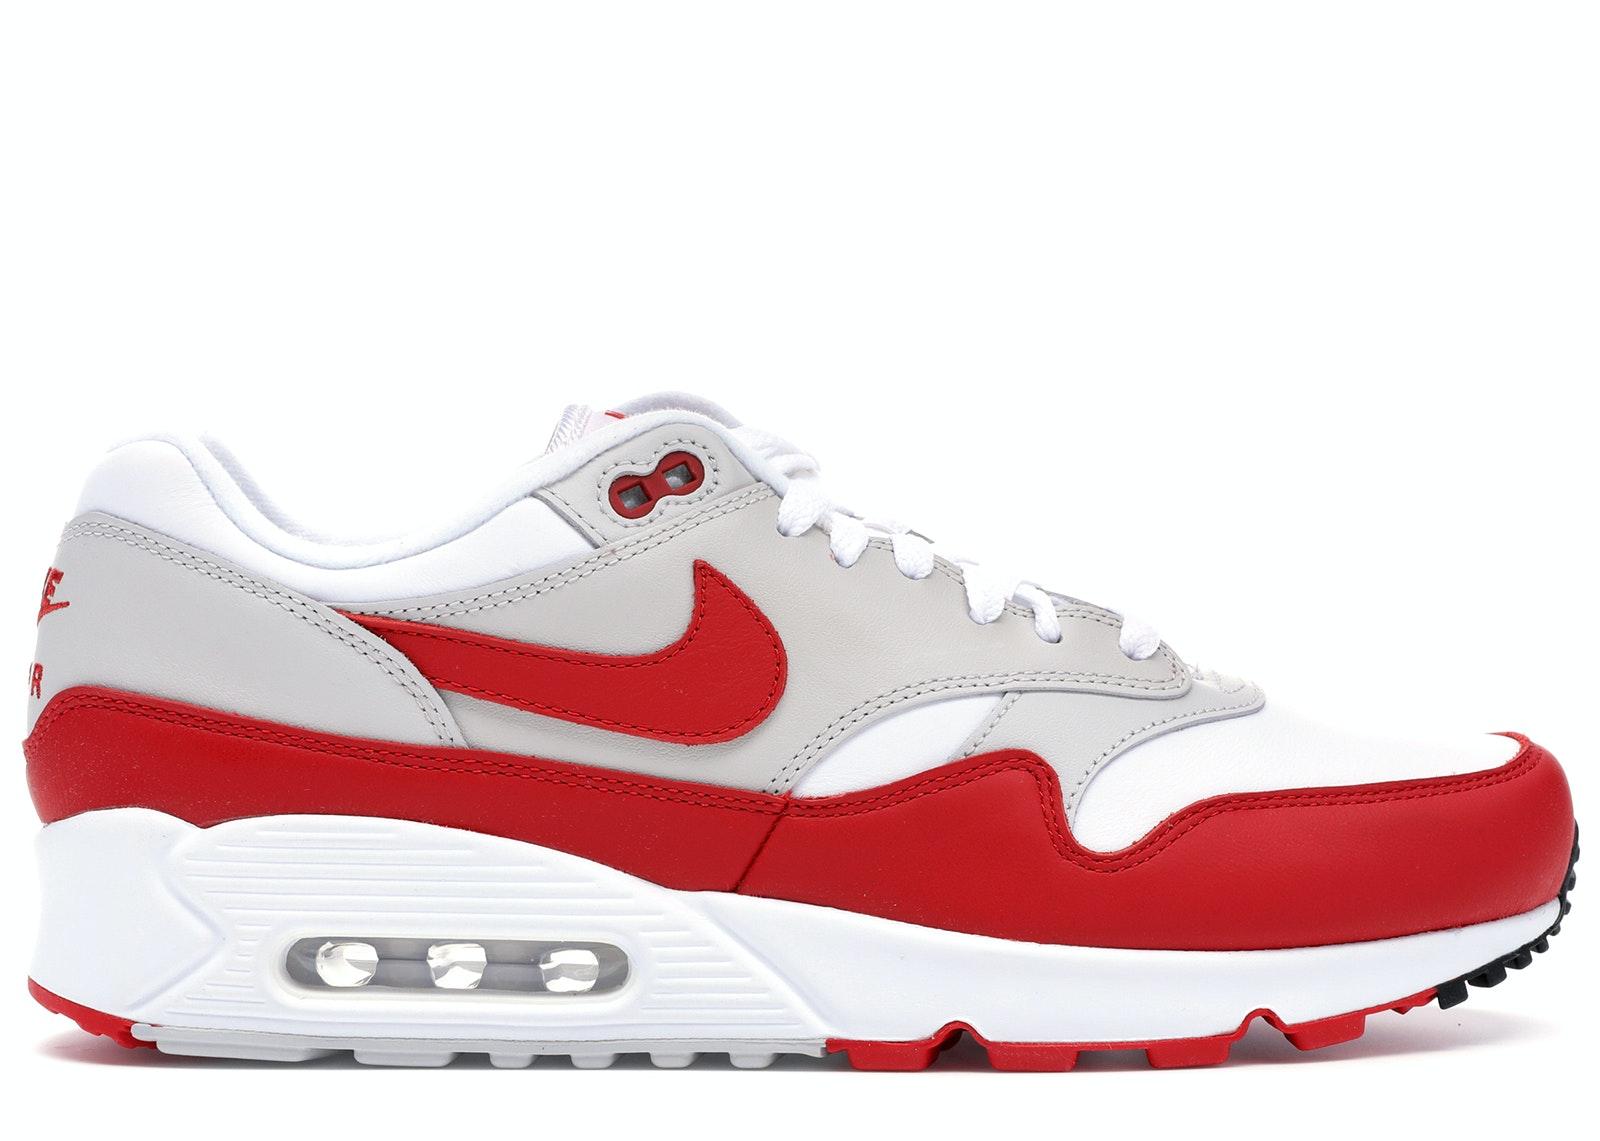 Air Max 90/1 Sport Red